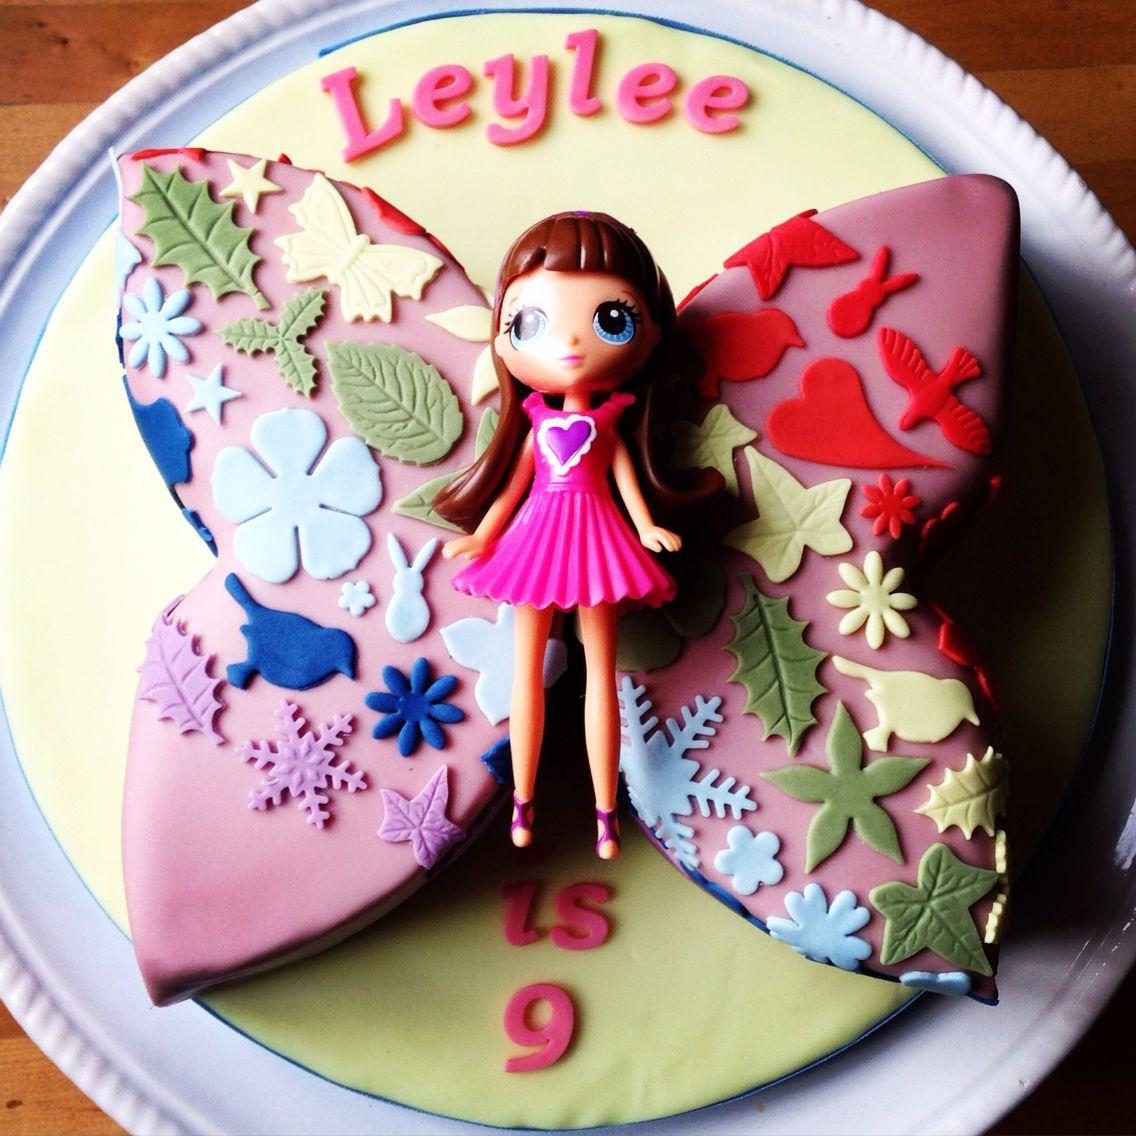 Leylee's 9th Birthday Littlest Pet Shop Rainbow Butterfly